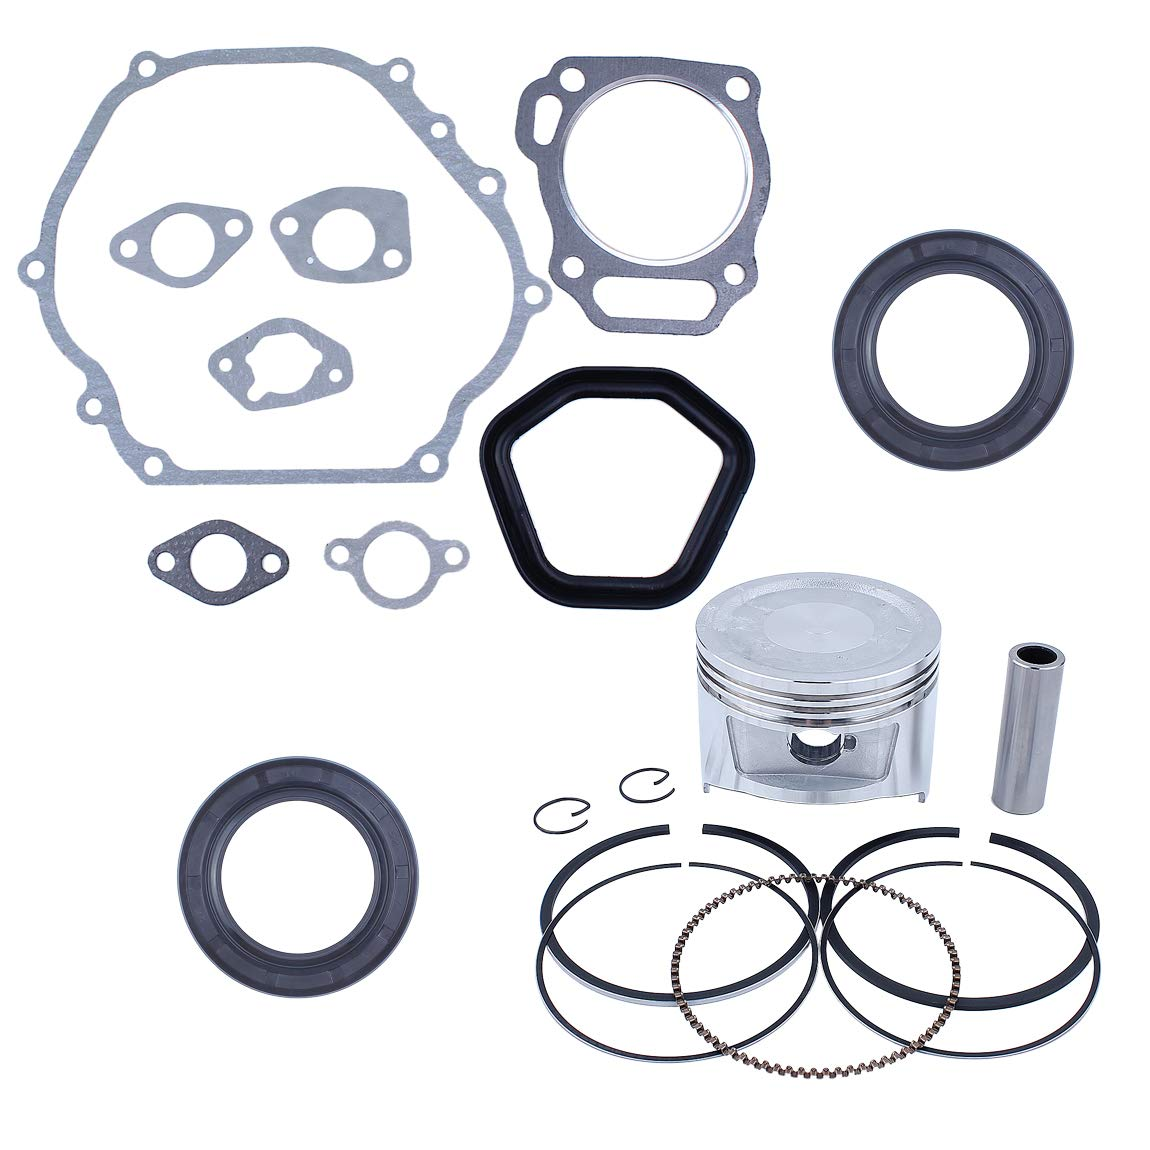 88mm Piston Rings Crankshaft Oil Seal Gasket Rebuild Kit for Honda GX390 188F E6500 5/6.5kw Gasoline Engine Generator Water Pump by Haishine